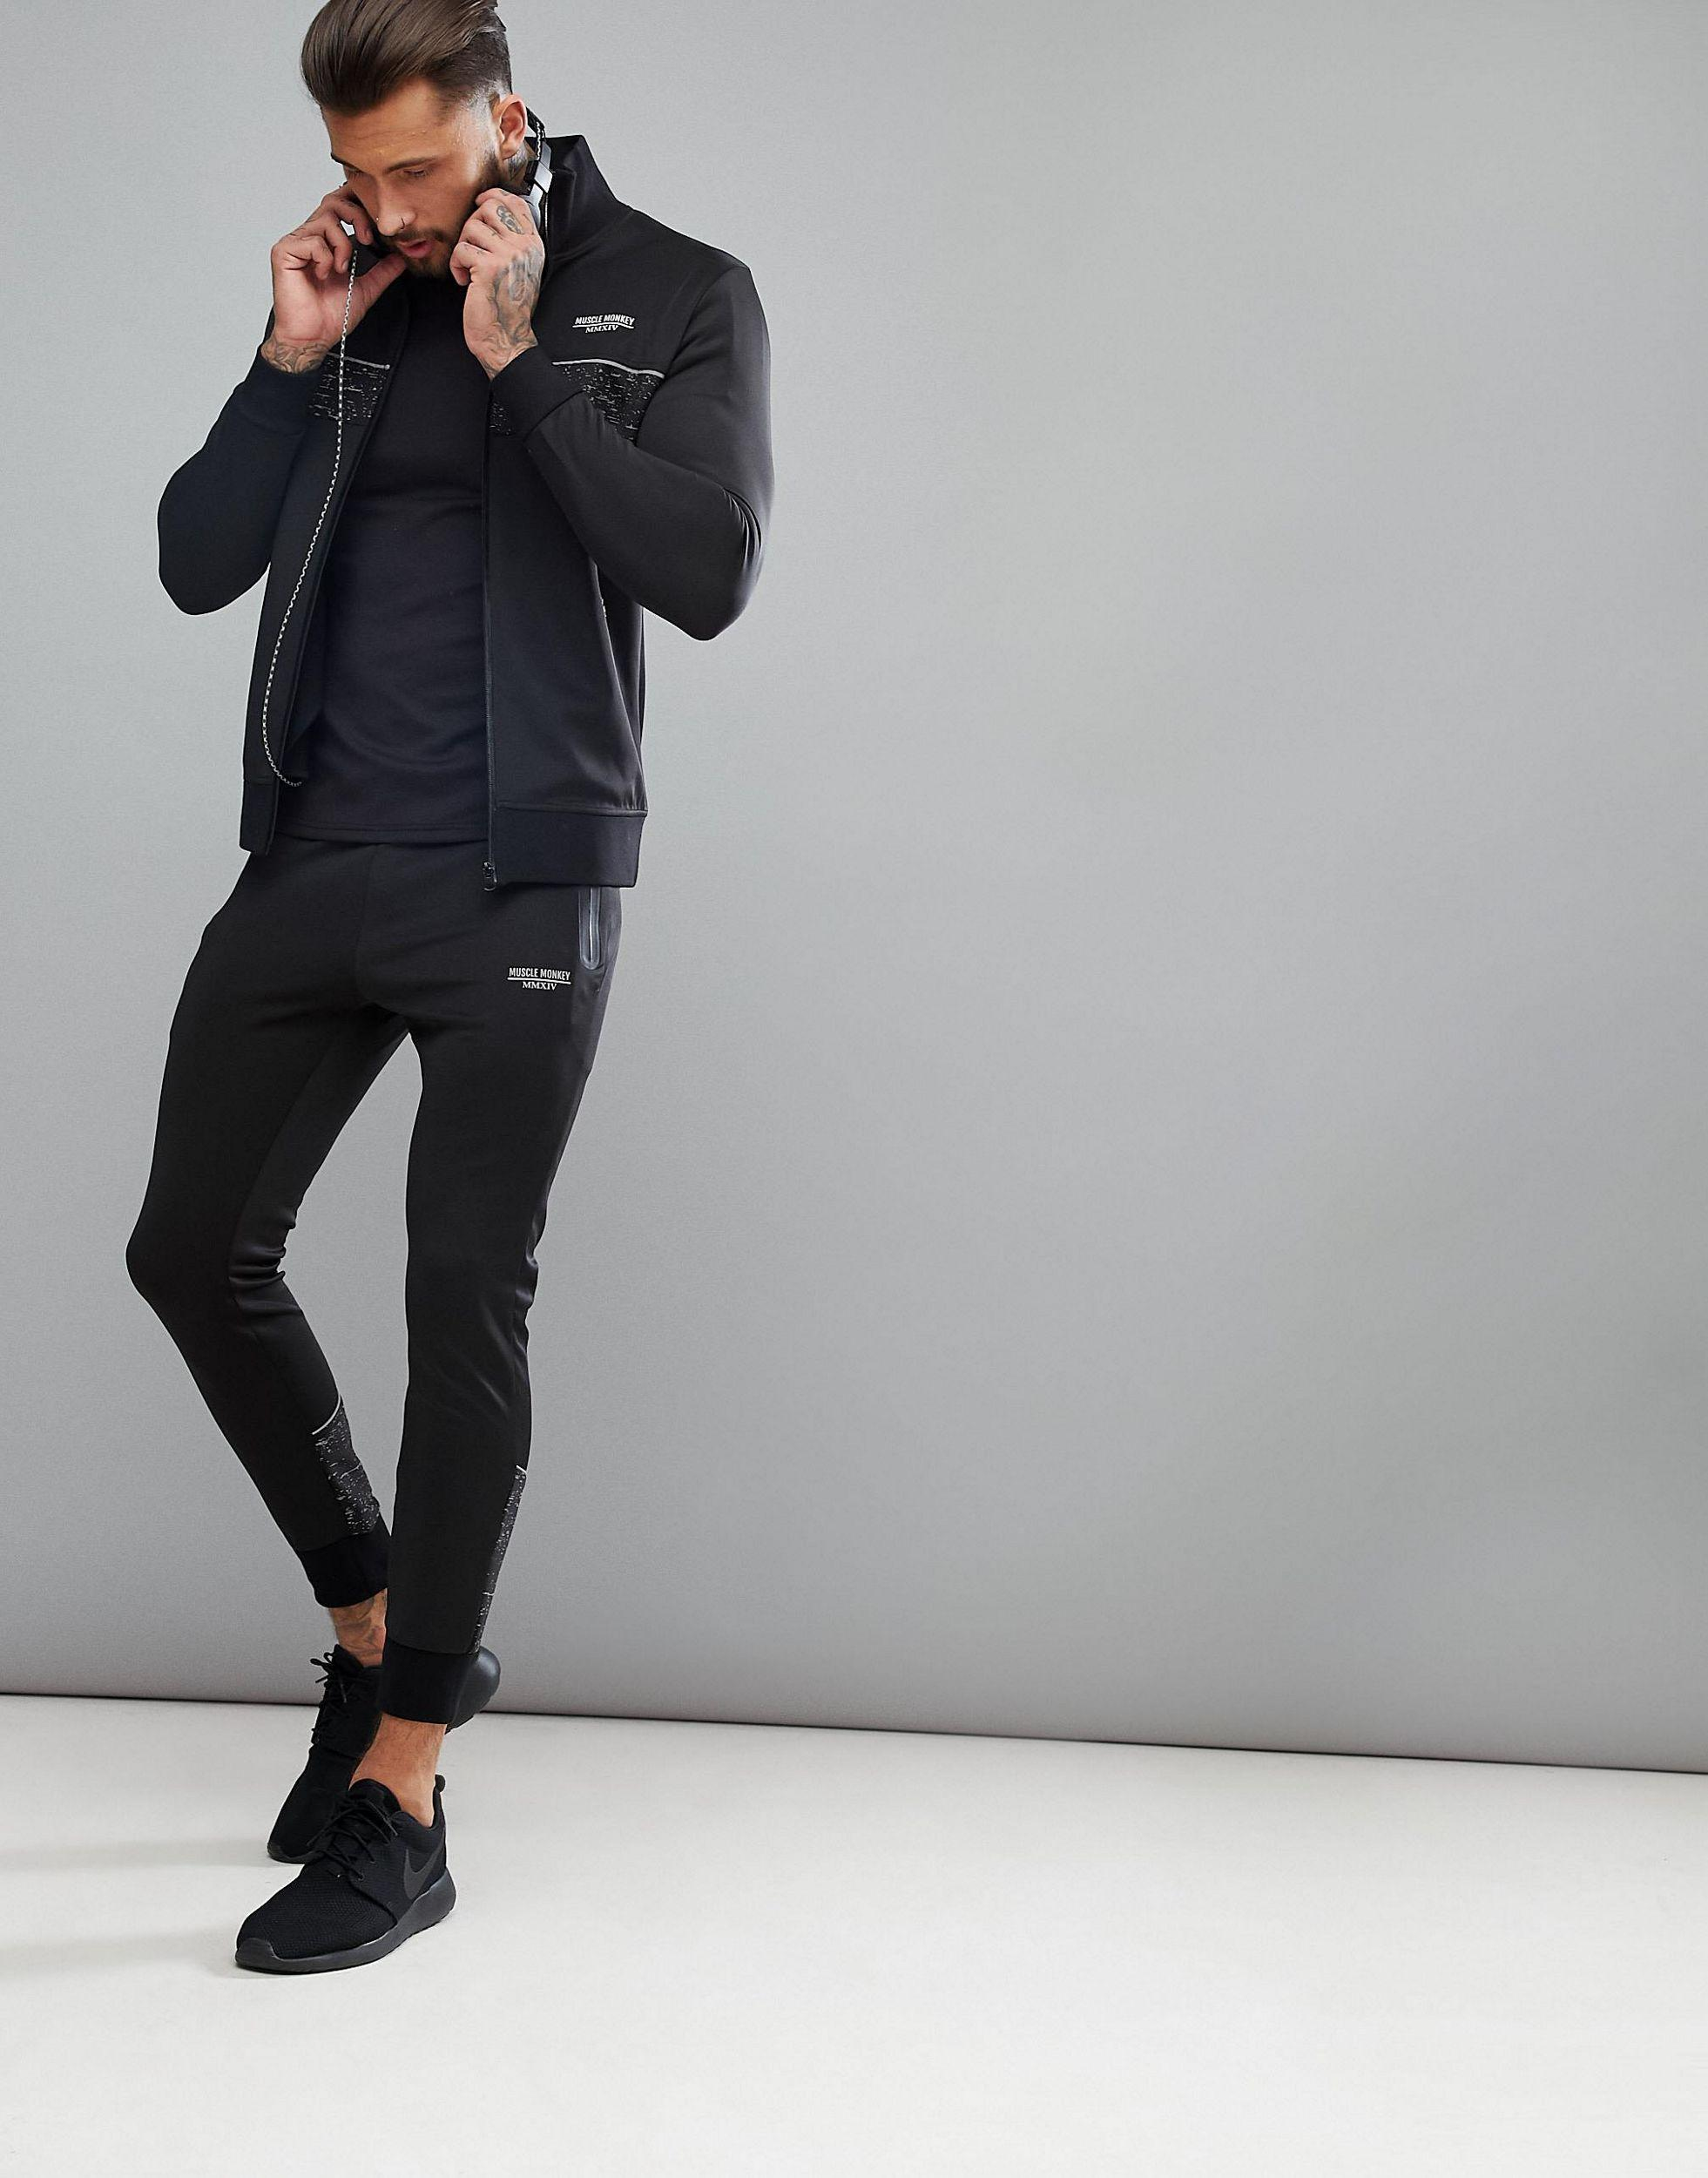 Muscle Monkey Track Jacket in Black for Men